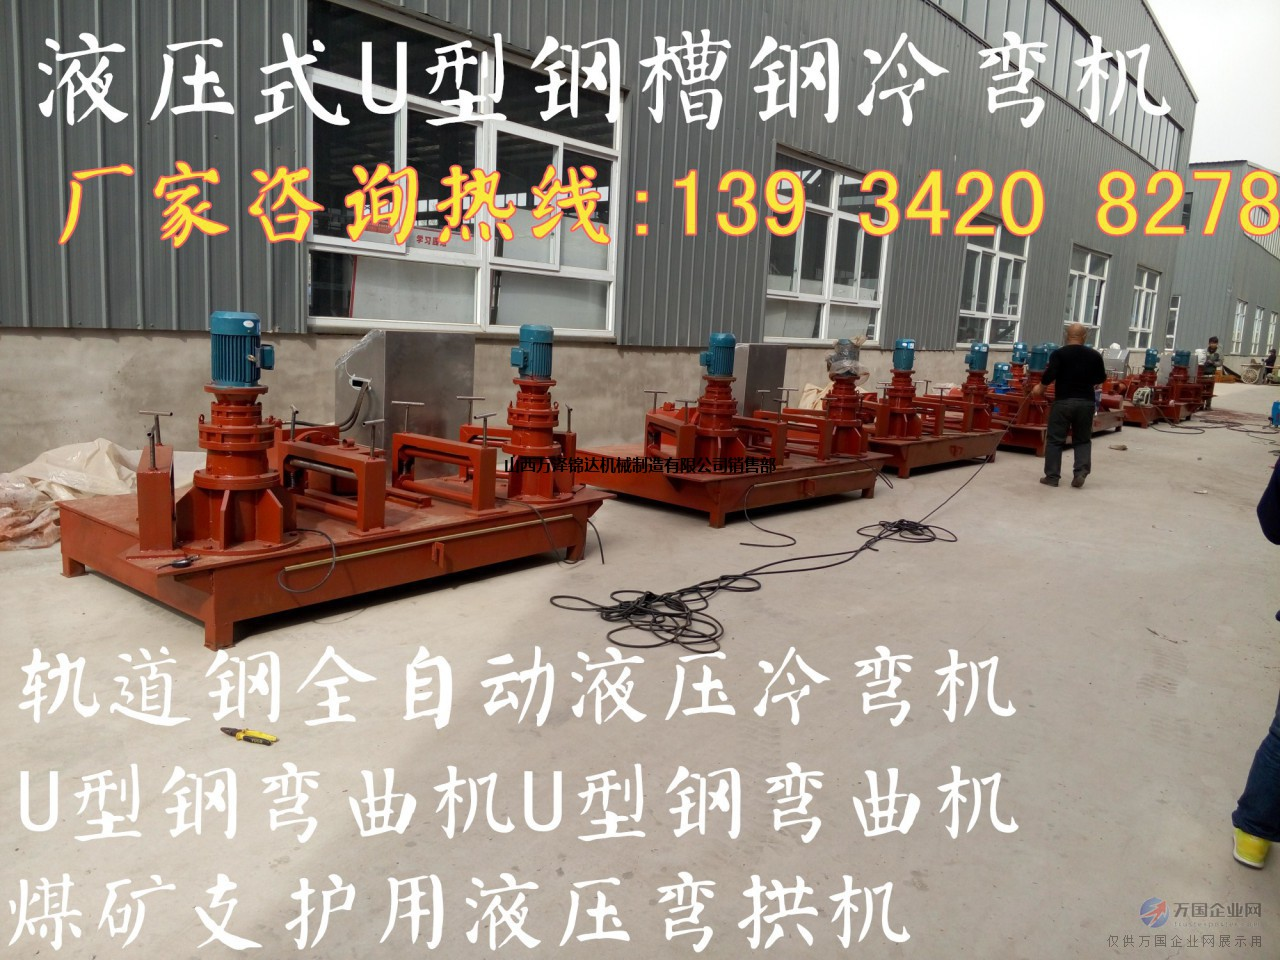 WGJ-300液压工字钢弯曲机(卷圆机滚圆机)弯拱机